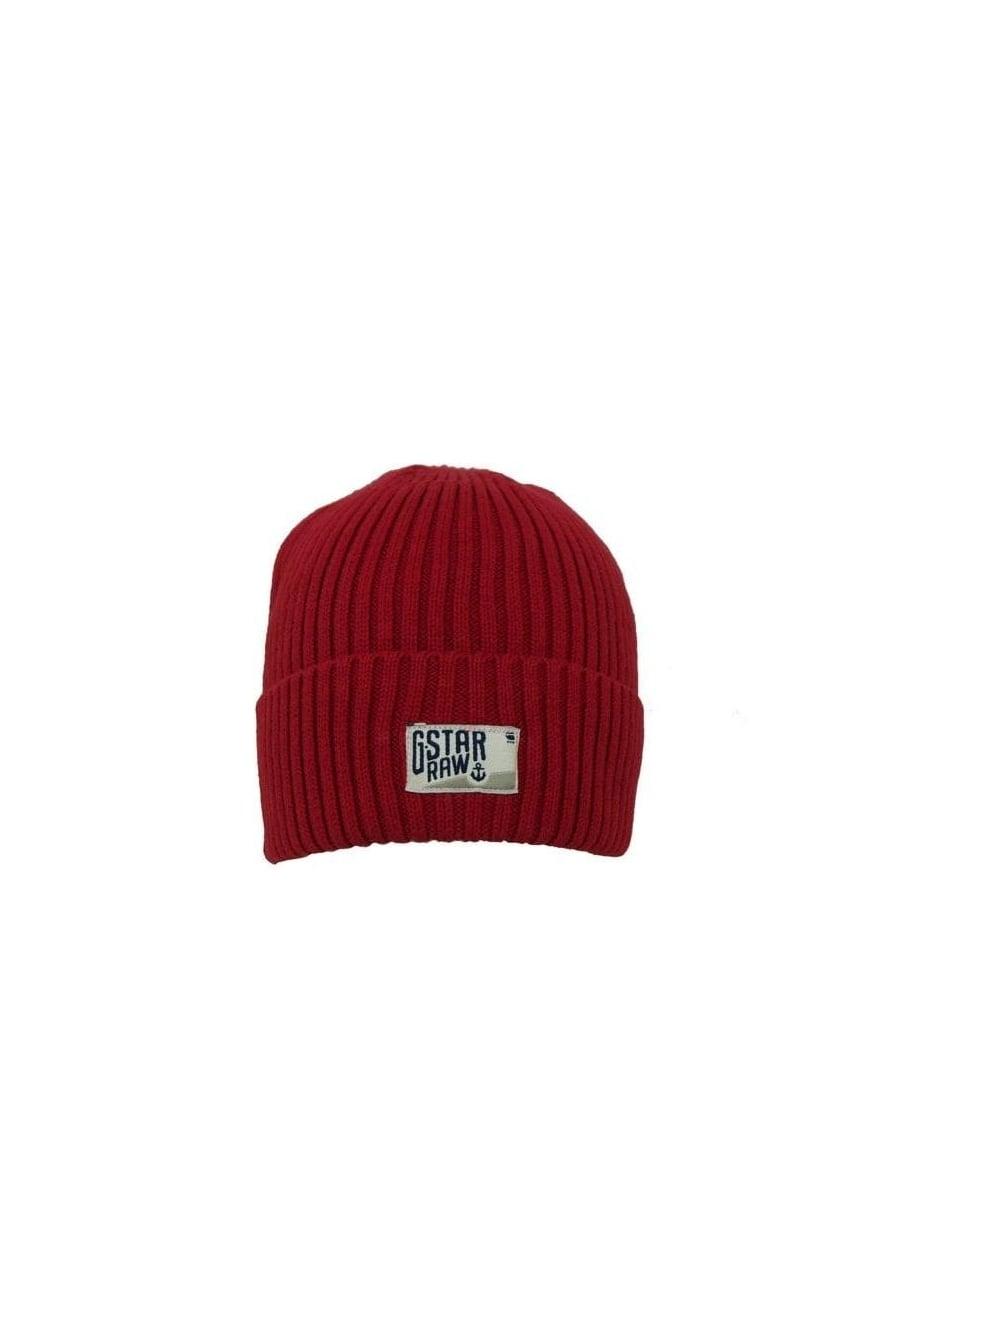 G-Star Jordan Beanie Hat in Red - Northern Threads c9c0e7b13ece